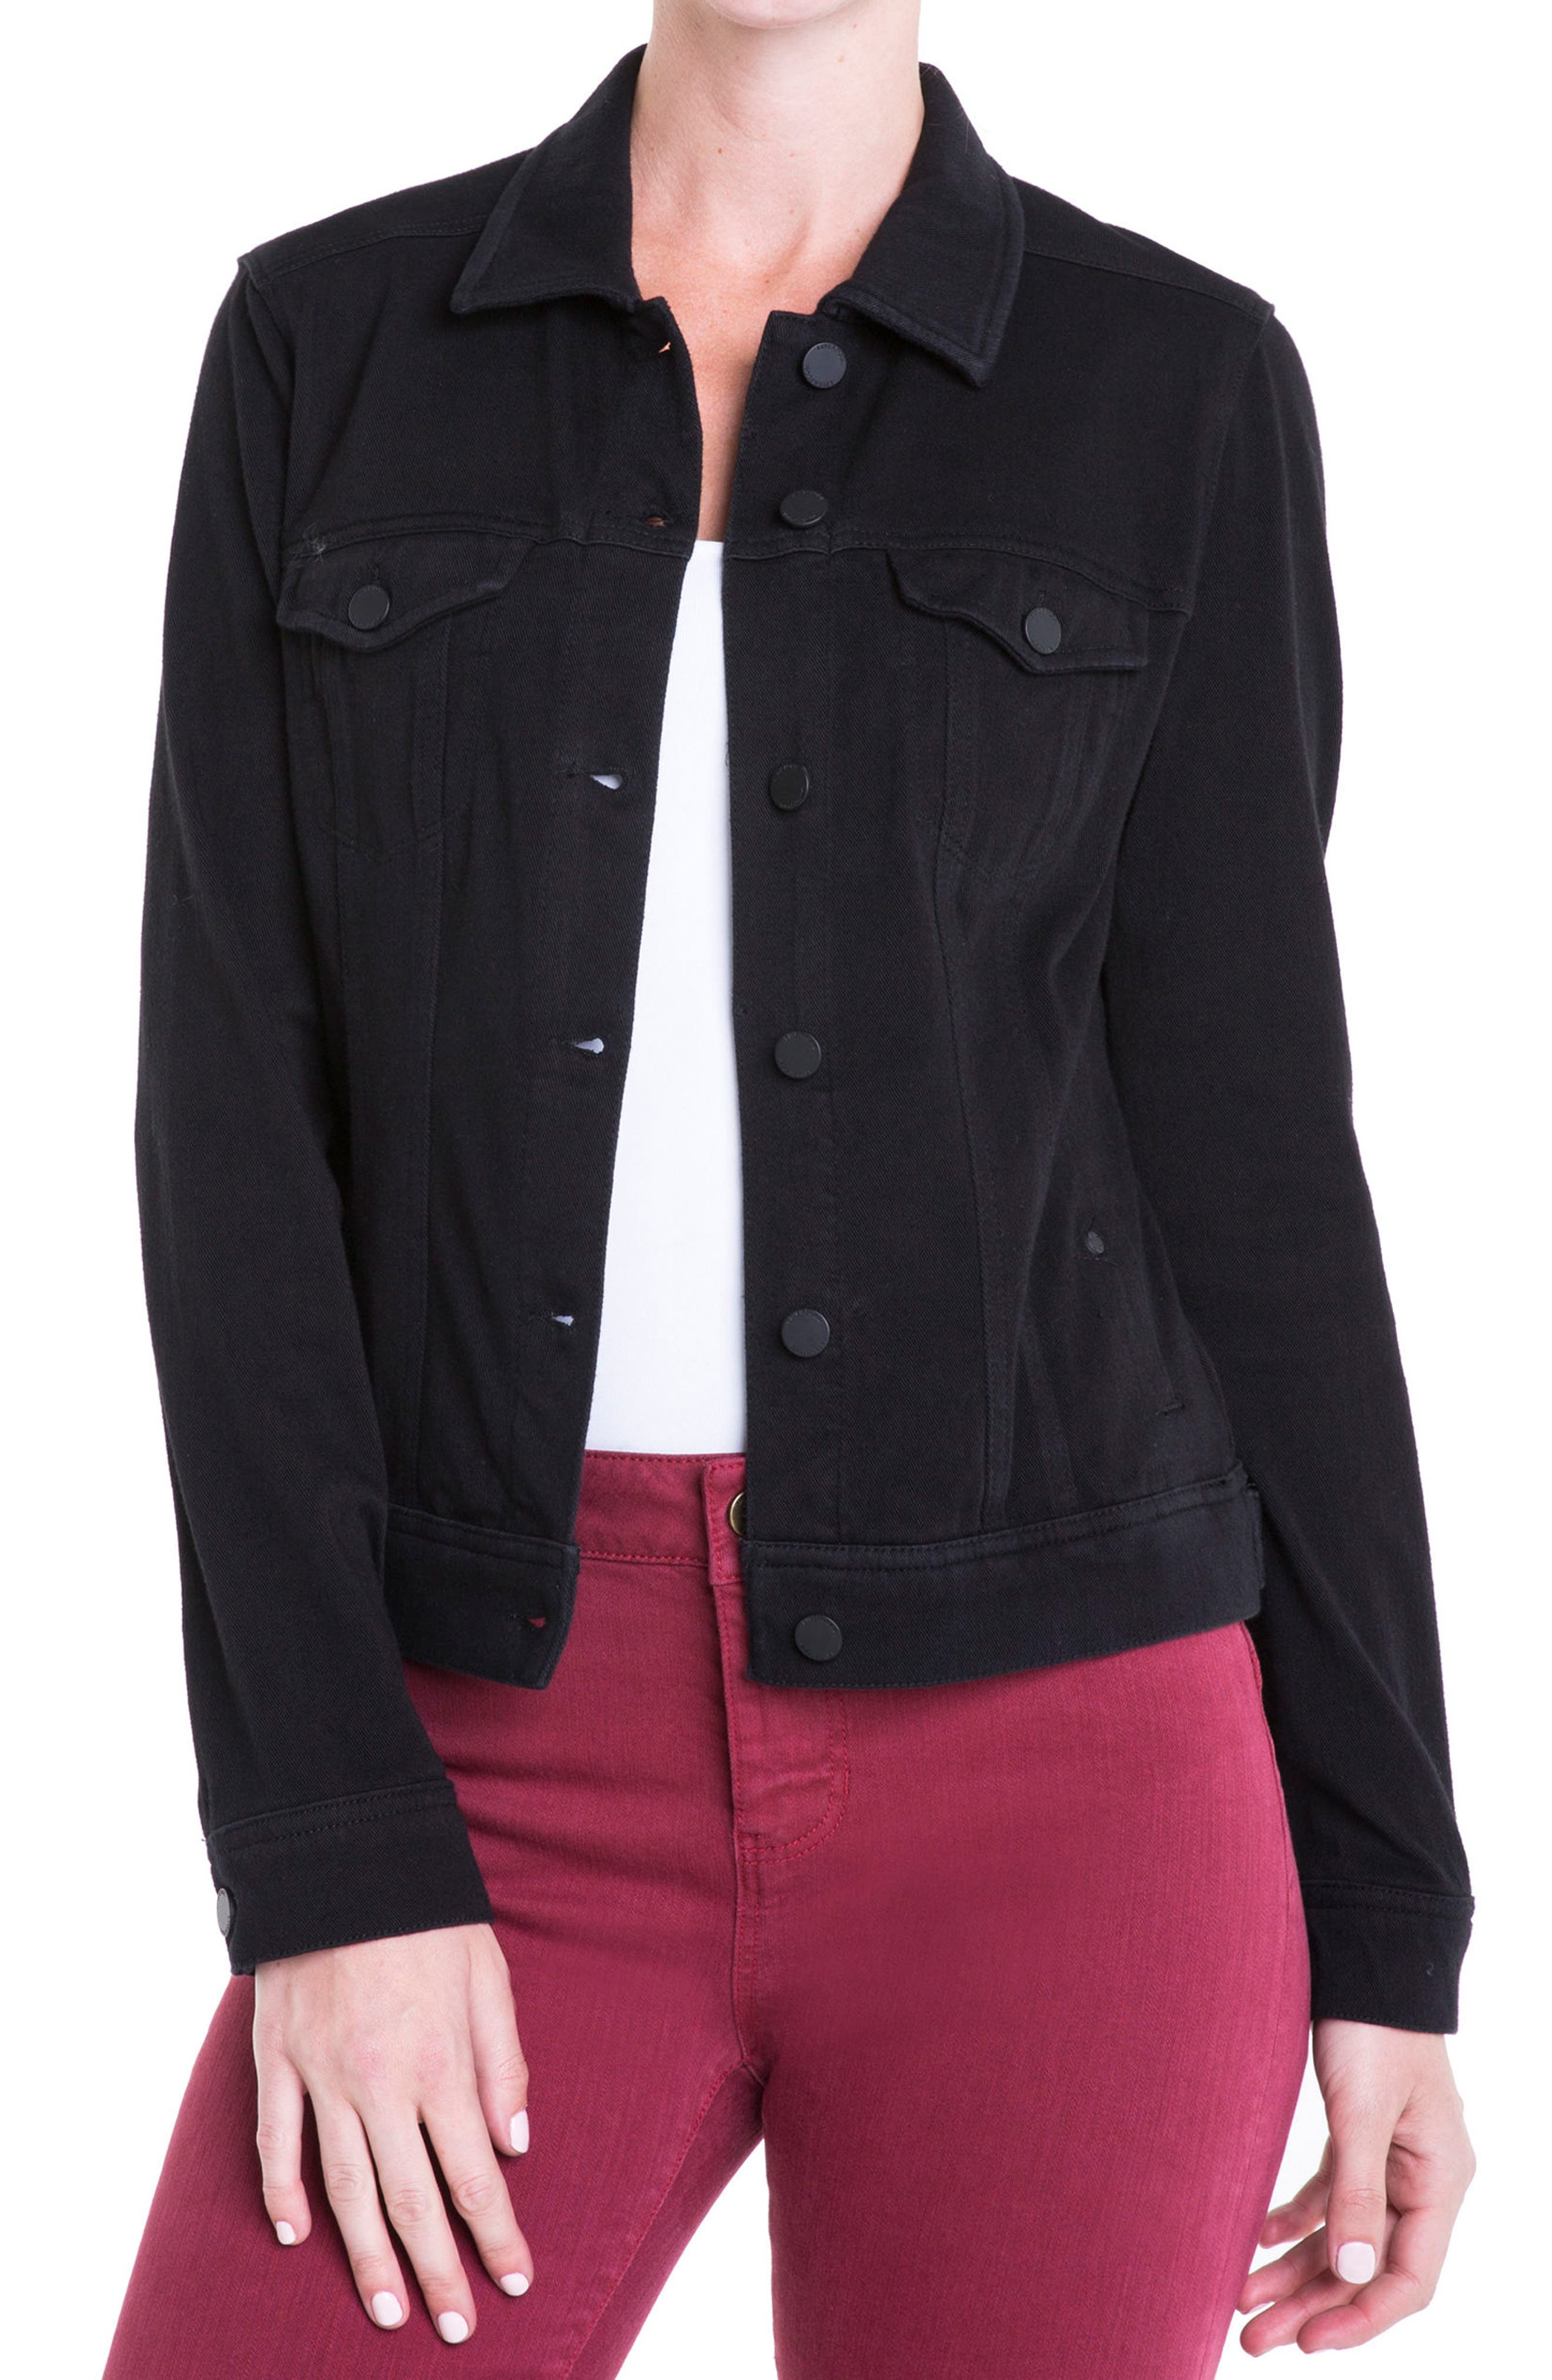 Alternate Image 1 Selected - Liverpool Jeans Co. Knit Denim Jacket (Petite)